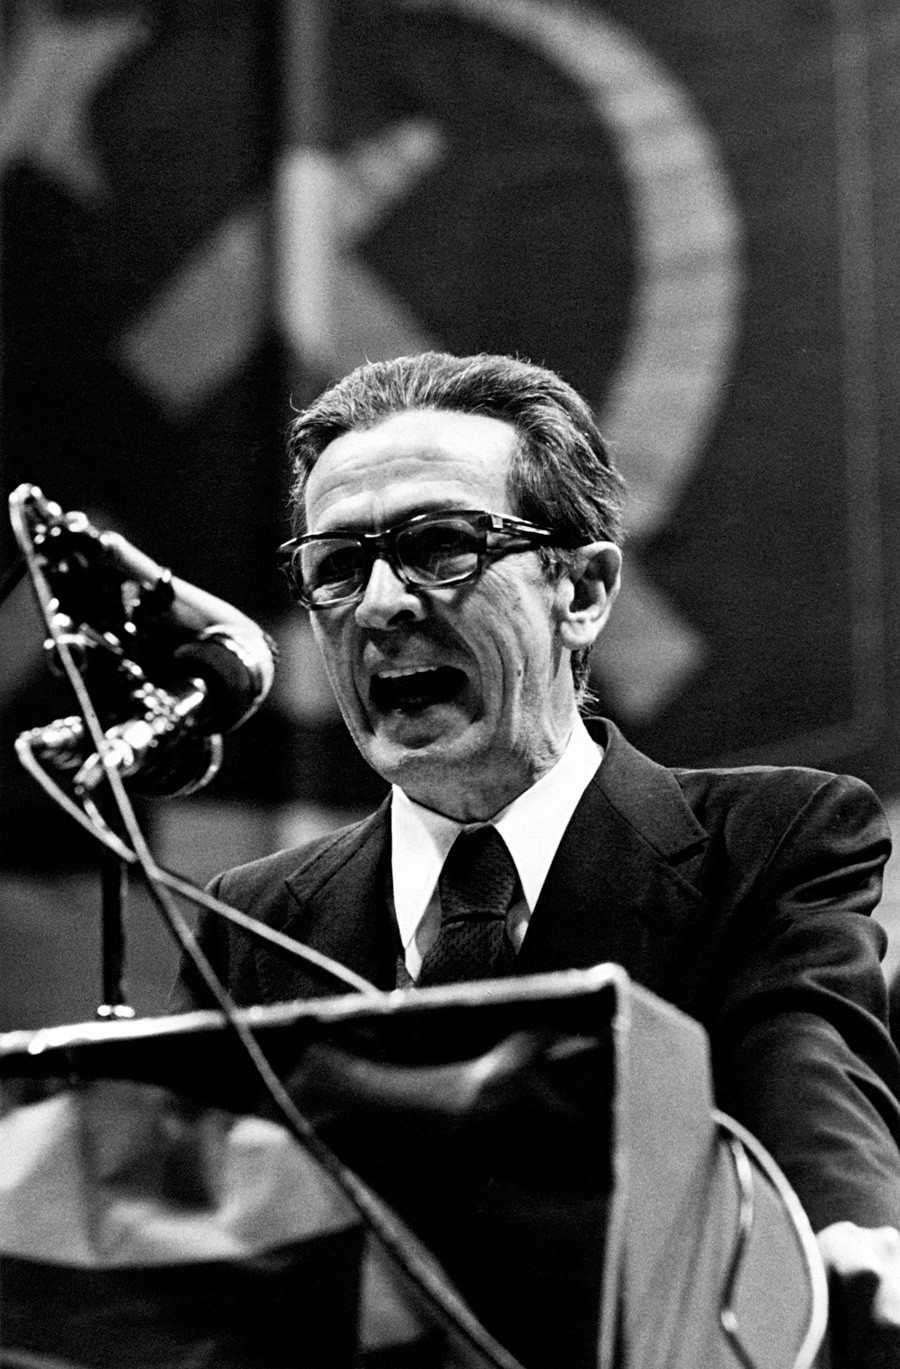 Enrico Berlinguer, segretario generale del Partito Comunista italiano